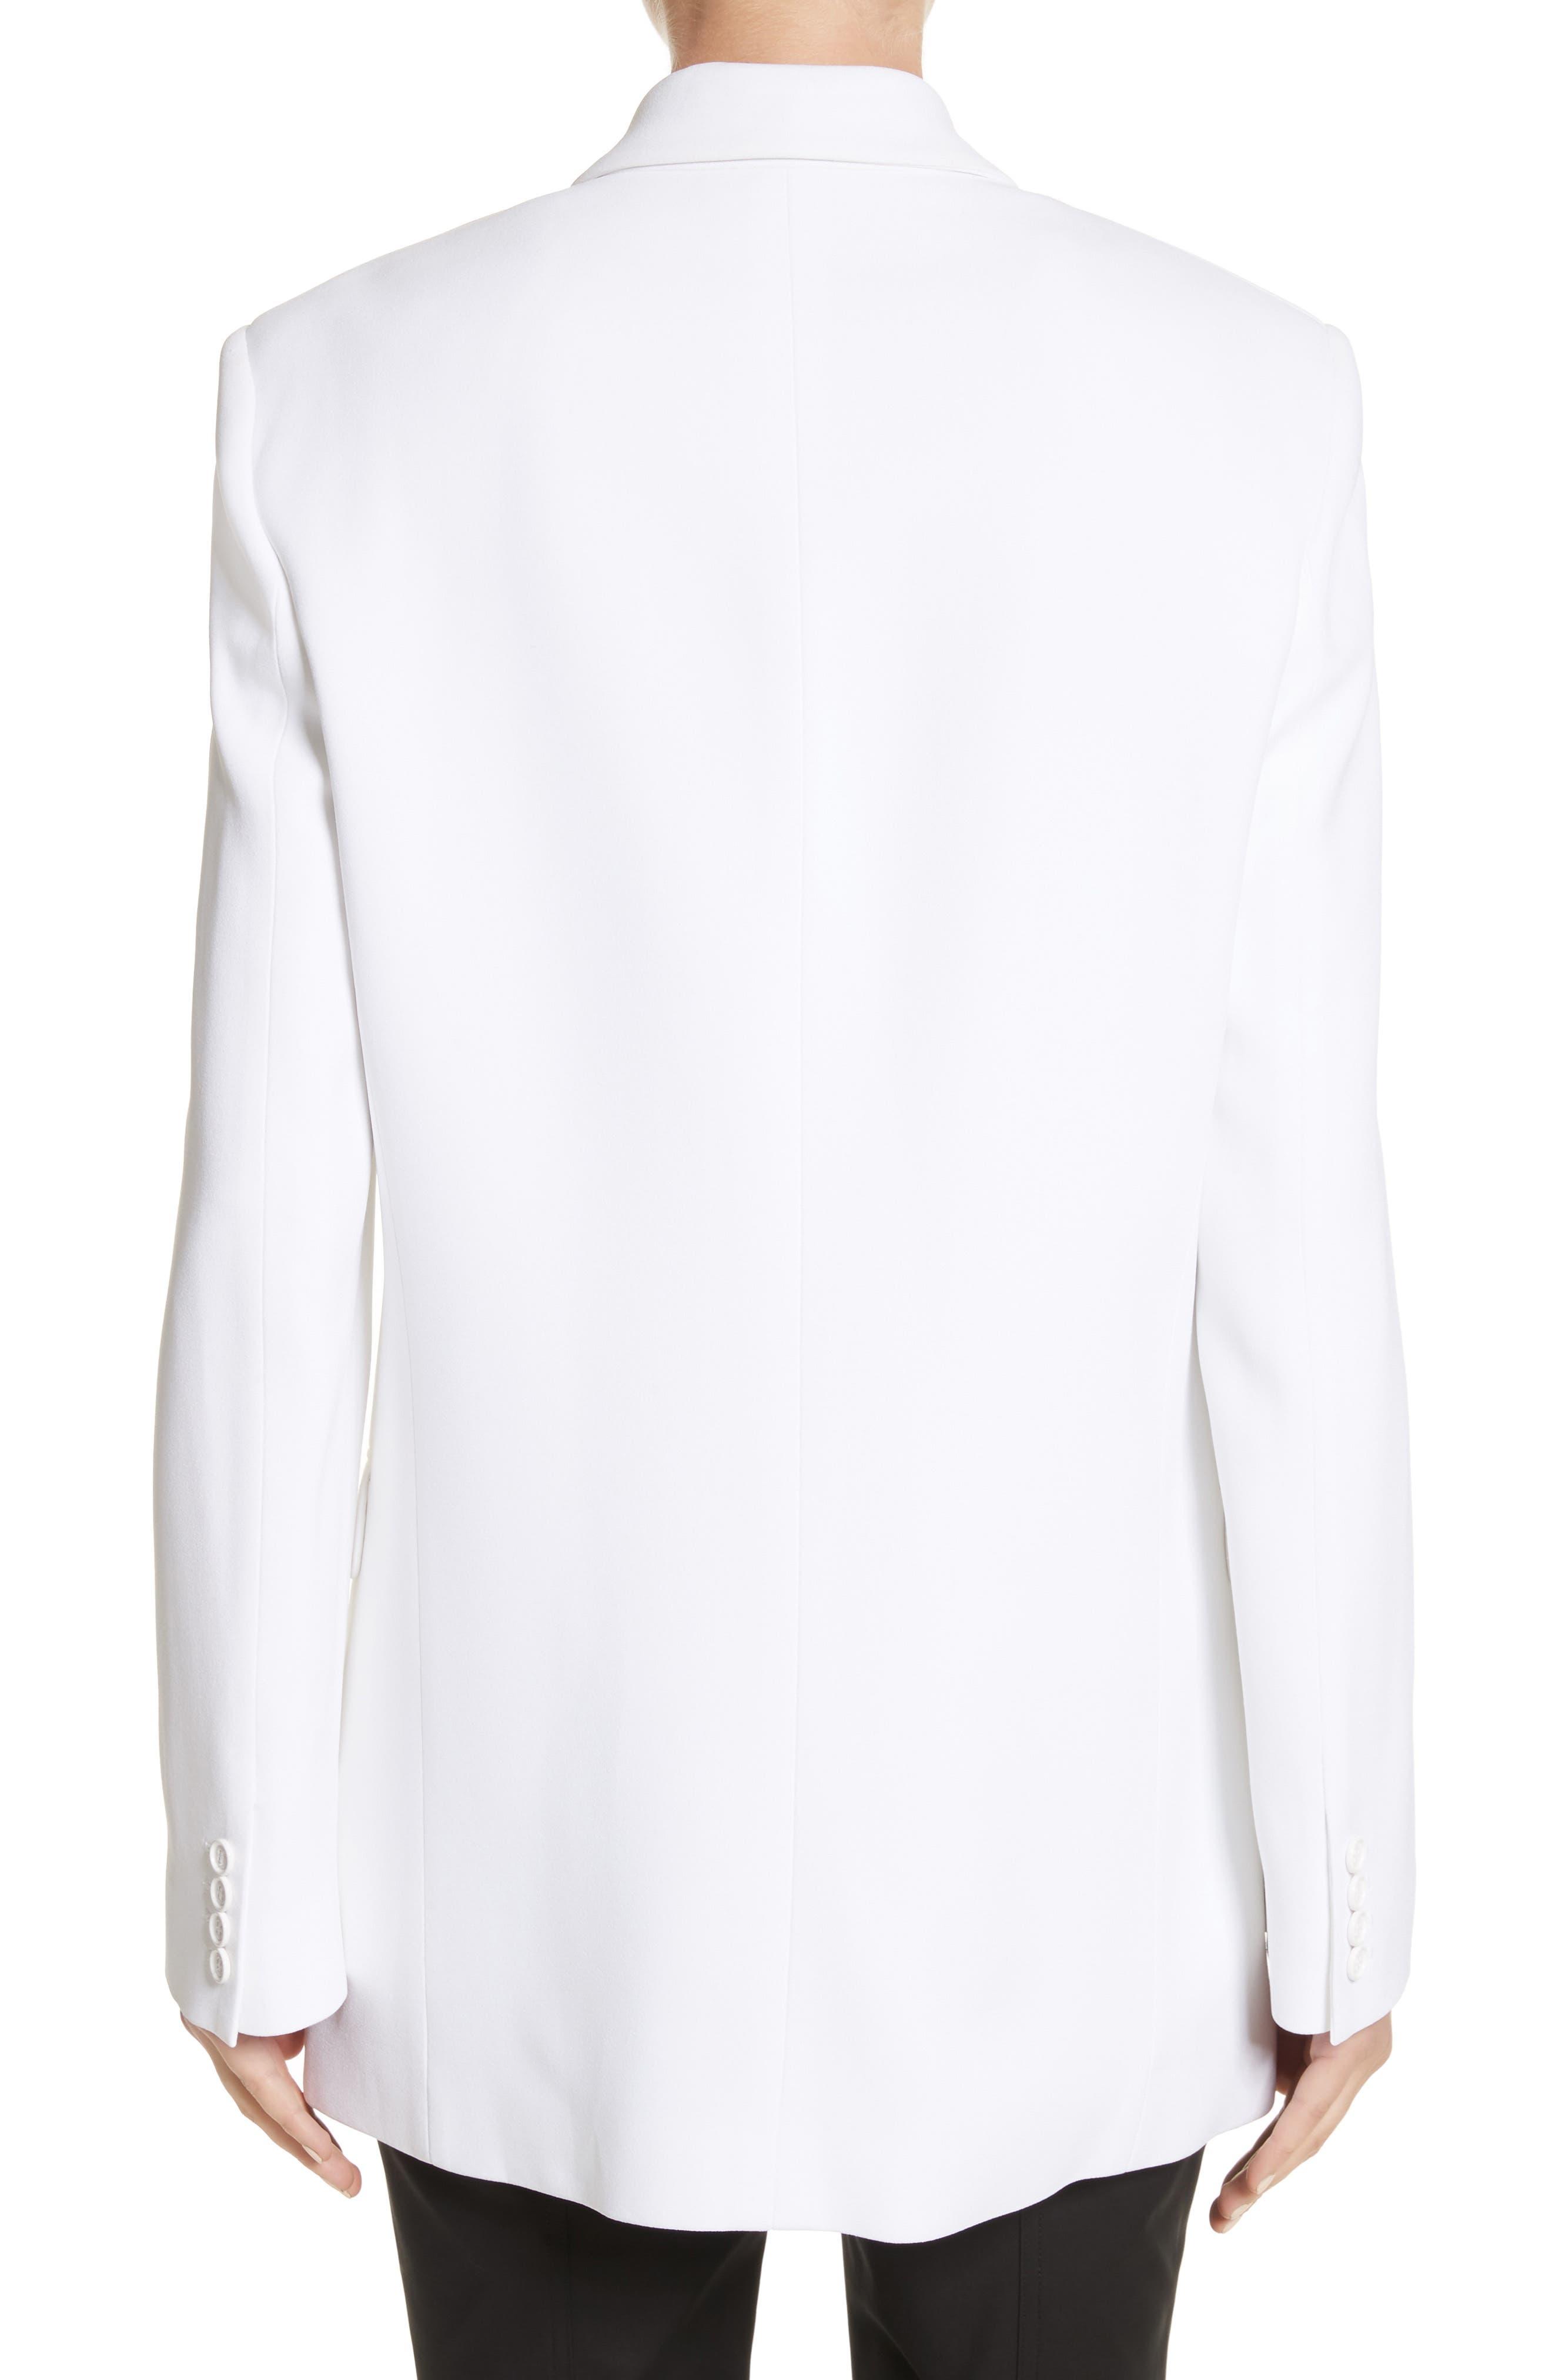 Double Crepe Sable Jacket,                             Alternate thumbnail 2, color,                             Optic White